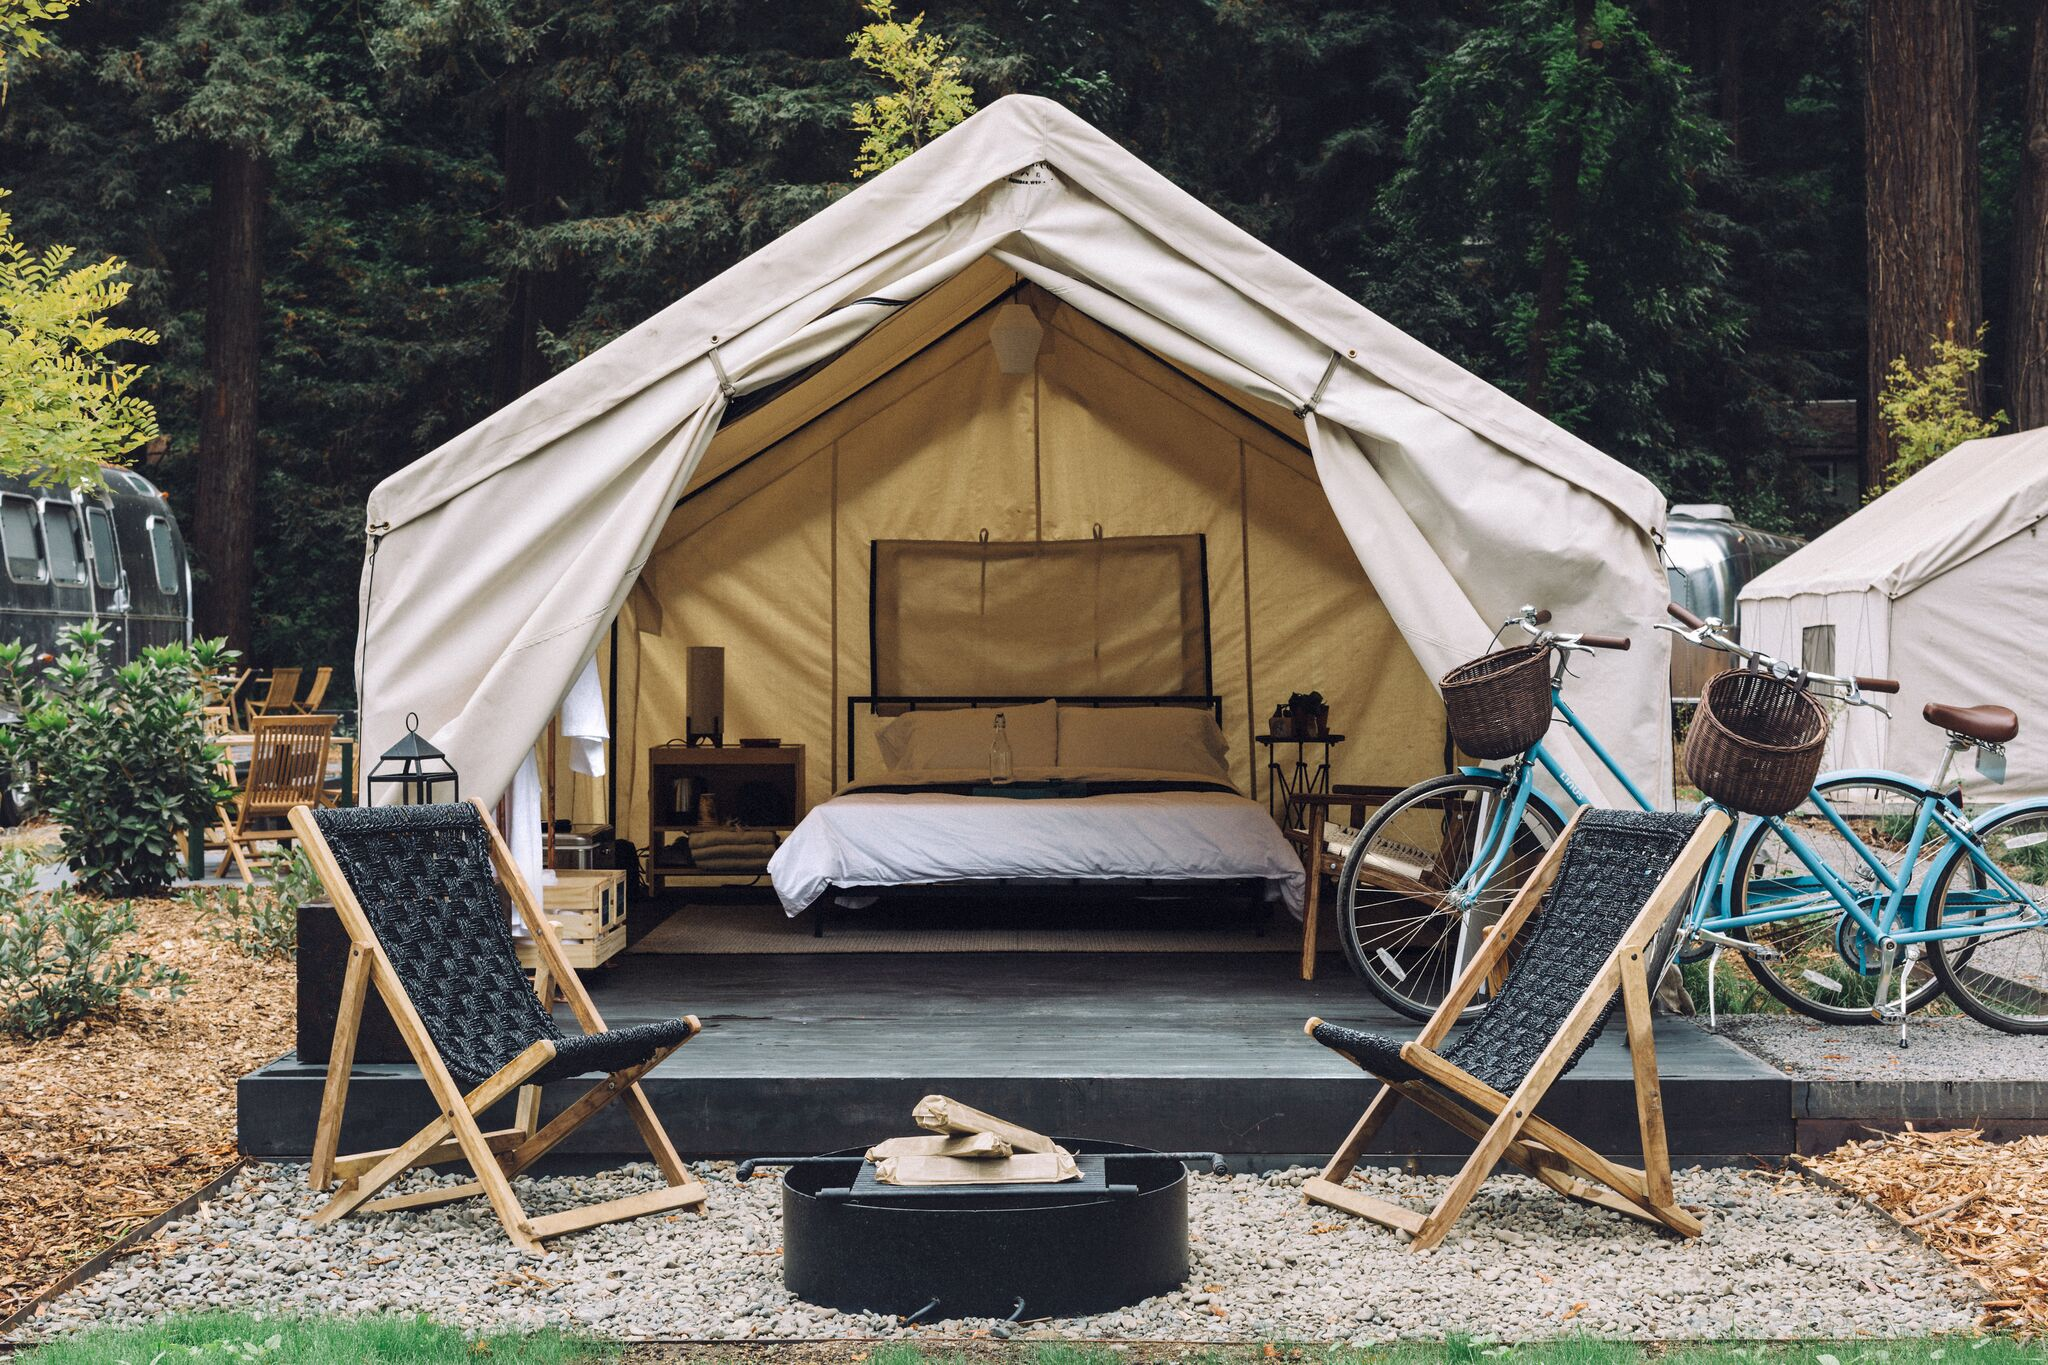 Front of luxury canvas tent. Photo Melanie Riccardi